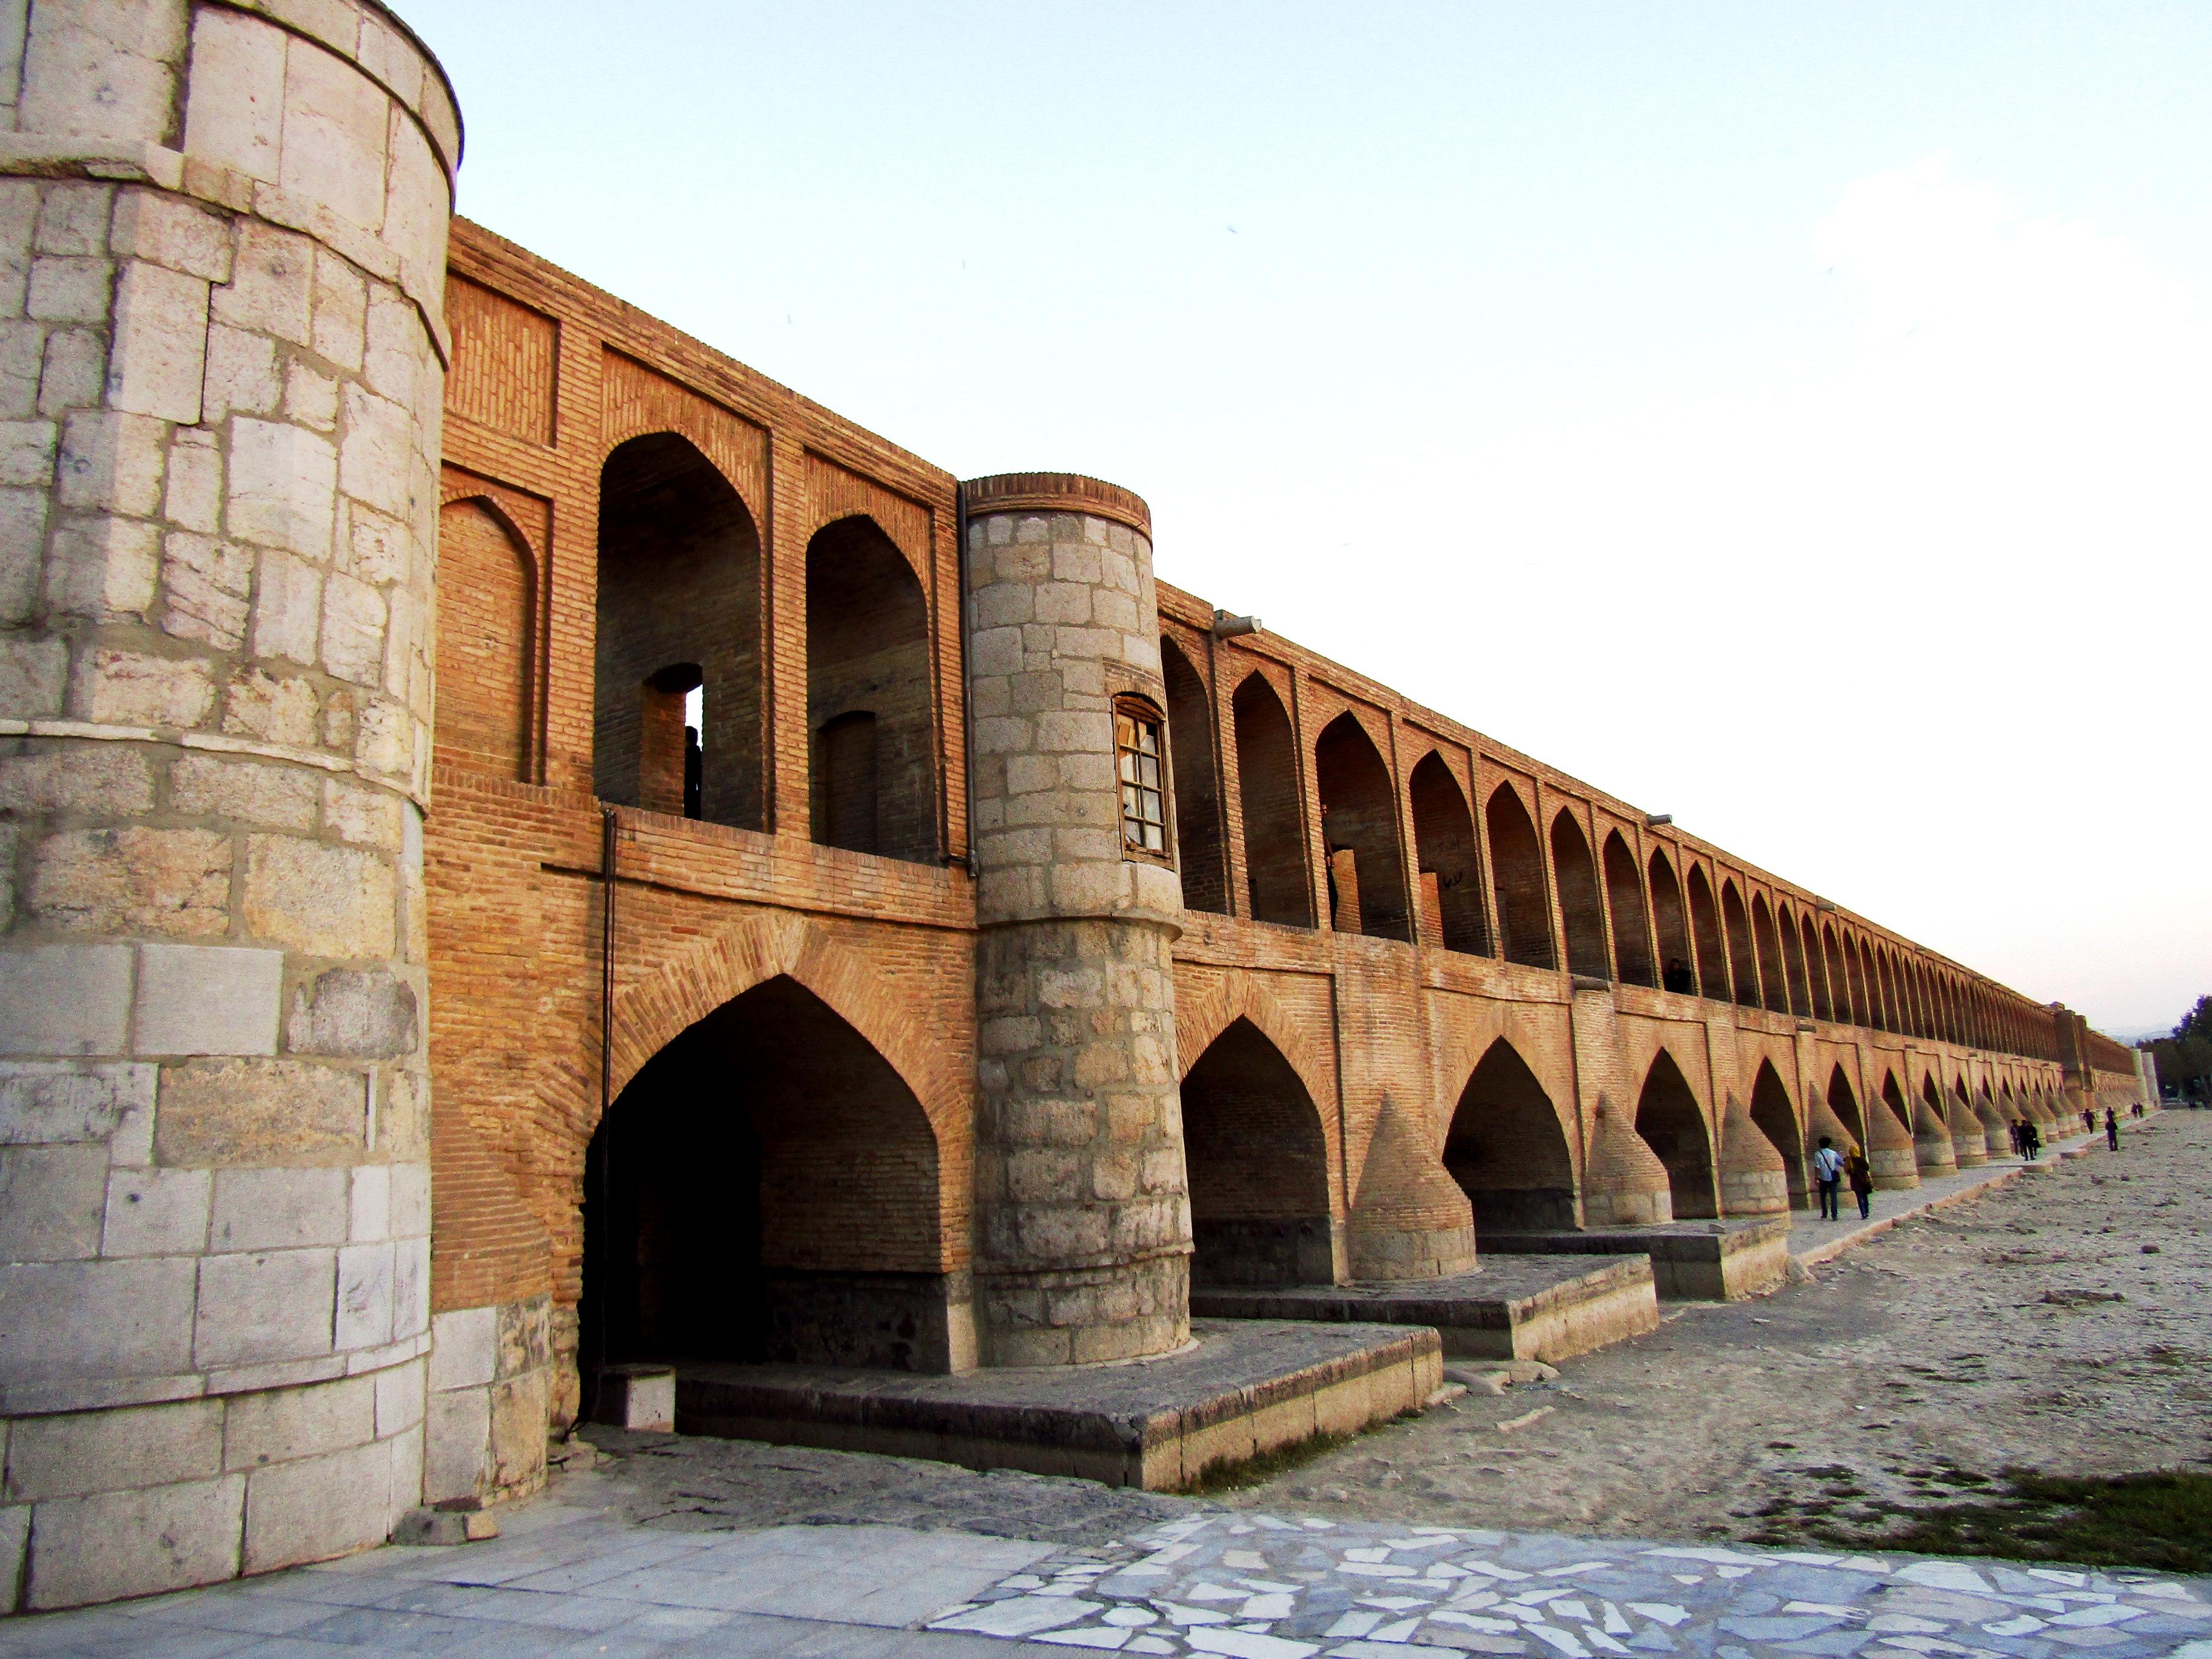 Si-o-seh pol (Allāhverdi Khan Bridge)